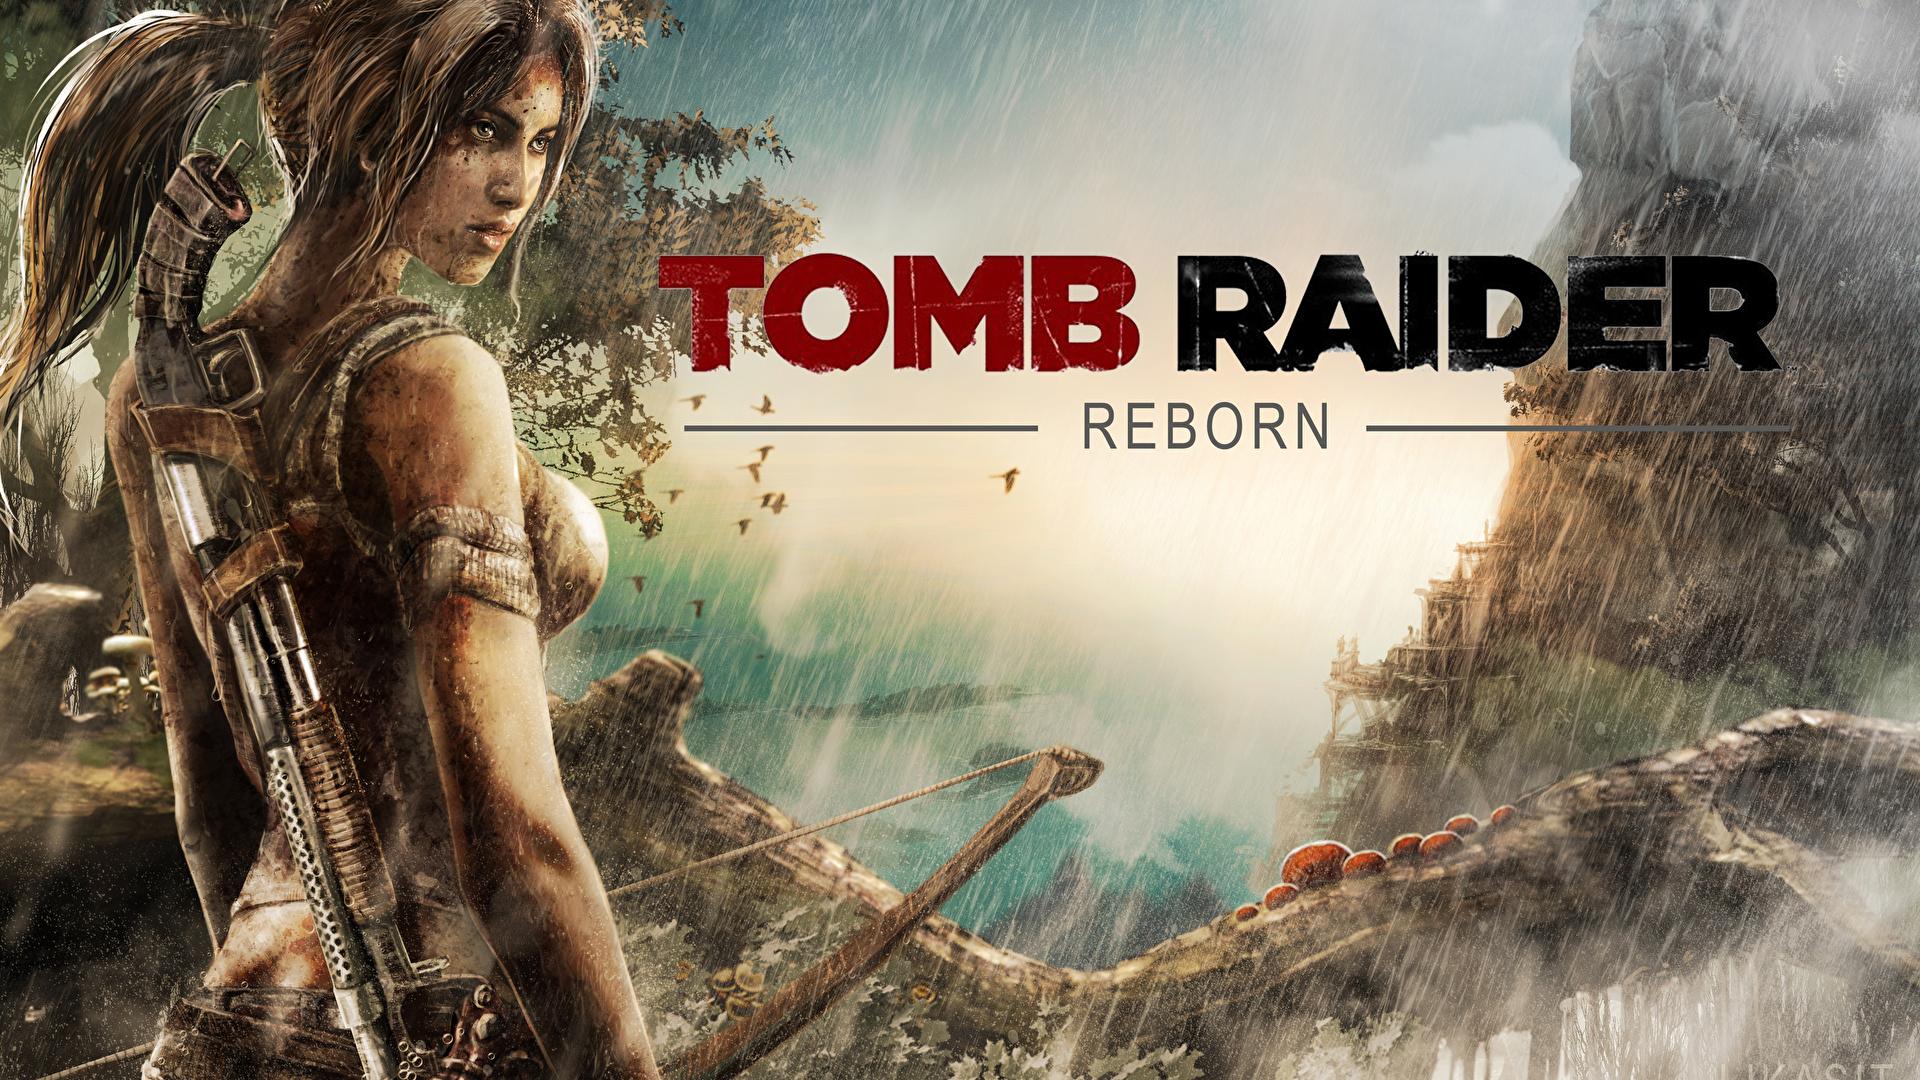 Images Tomb Raider 2013 Archers Lara Croft Female Vdeo 1920x1080